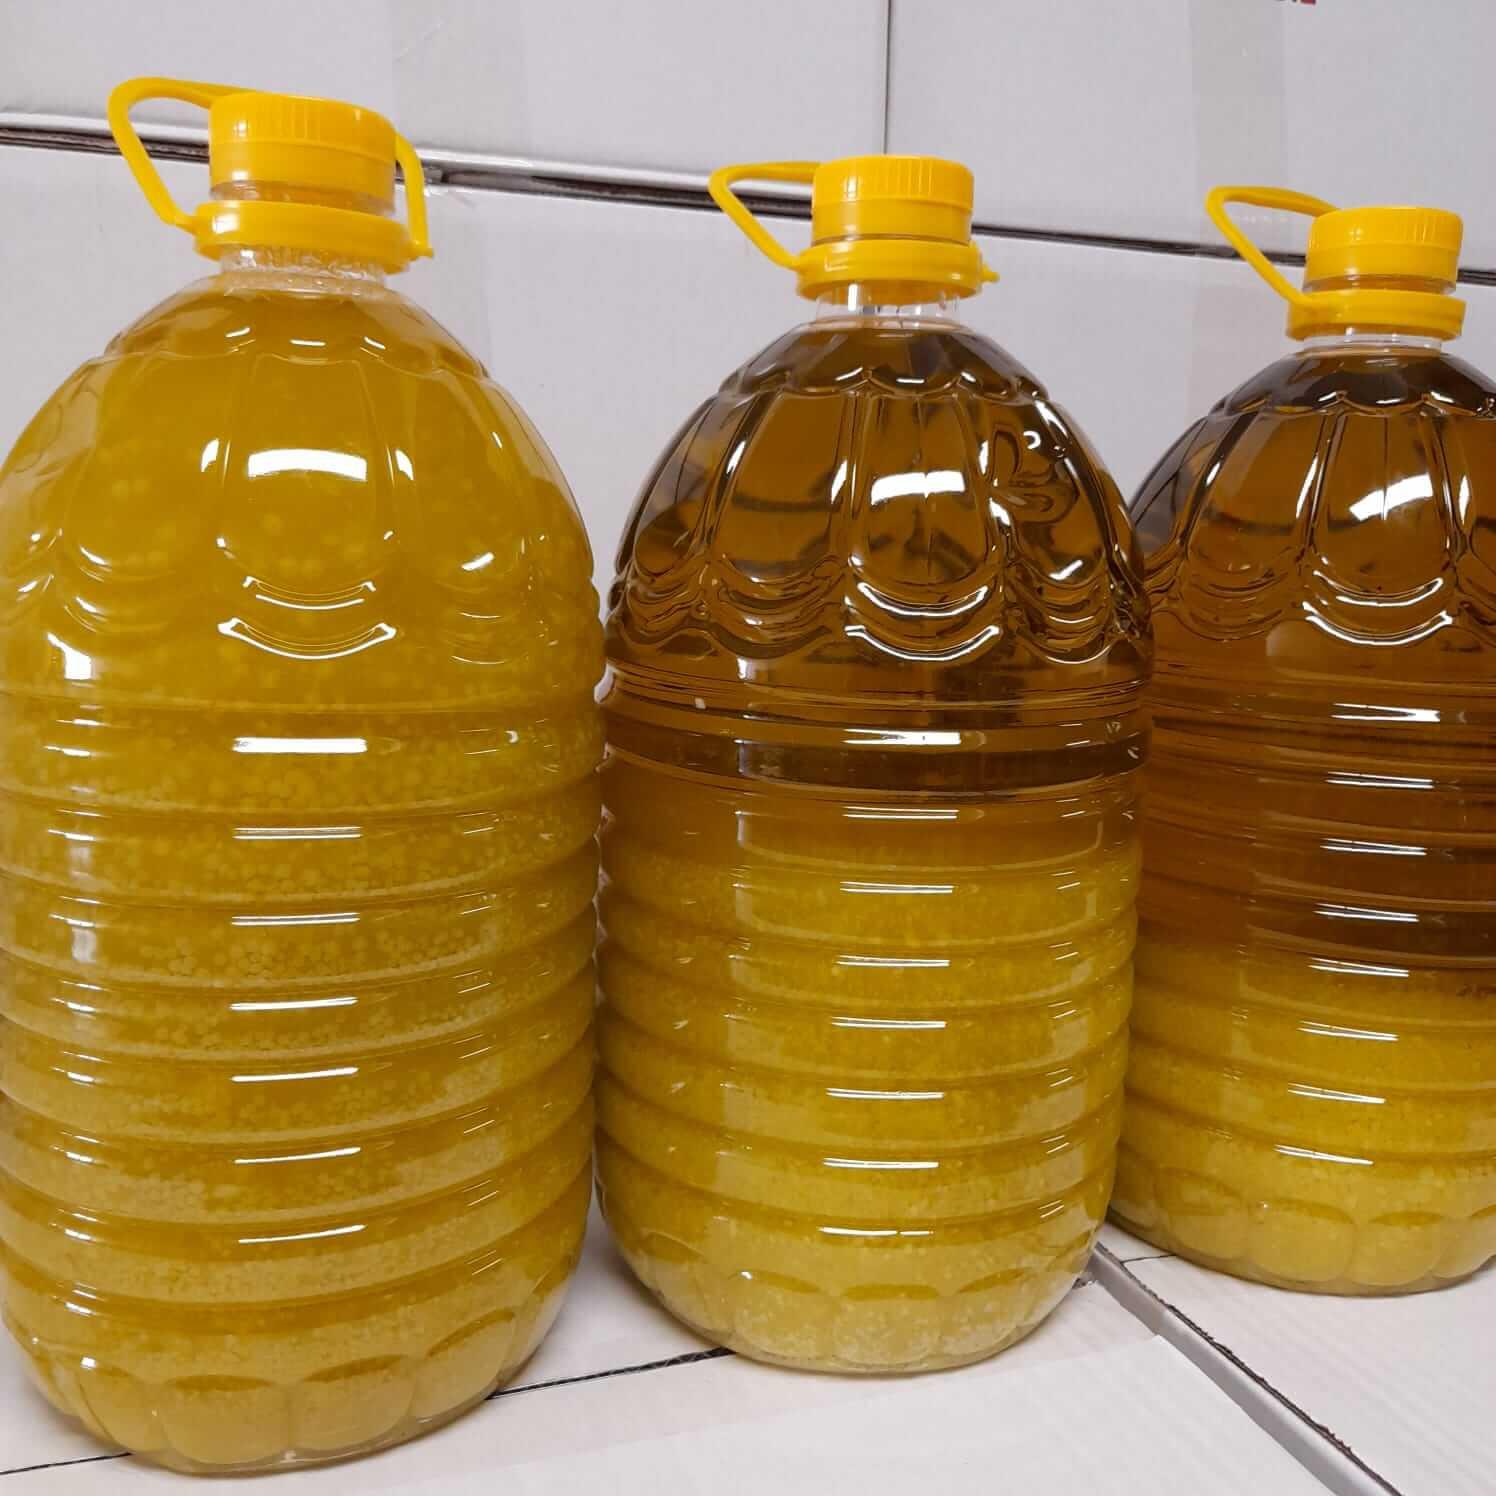 aceite de oliva grumos blancos